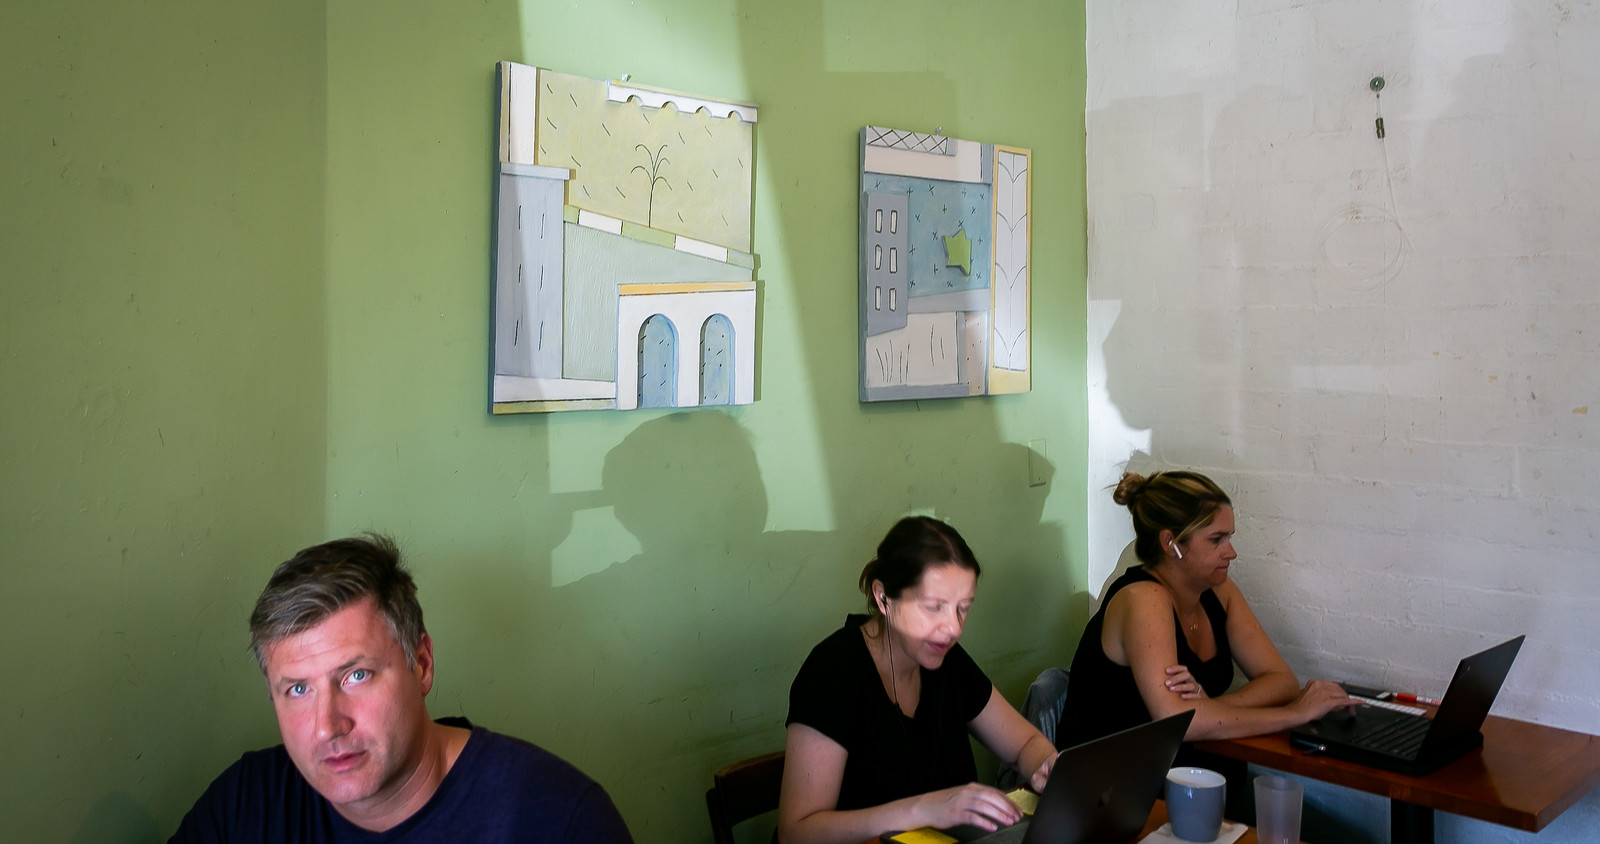 Quirky Berkeley in Berkeley, Calif. on August 21st, 2019.